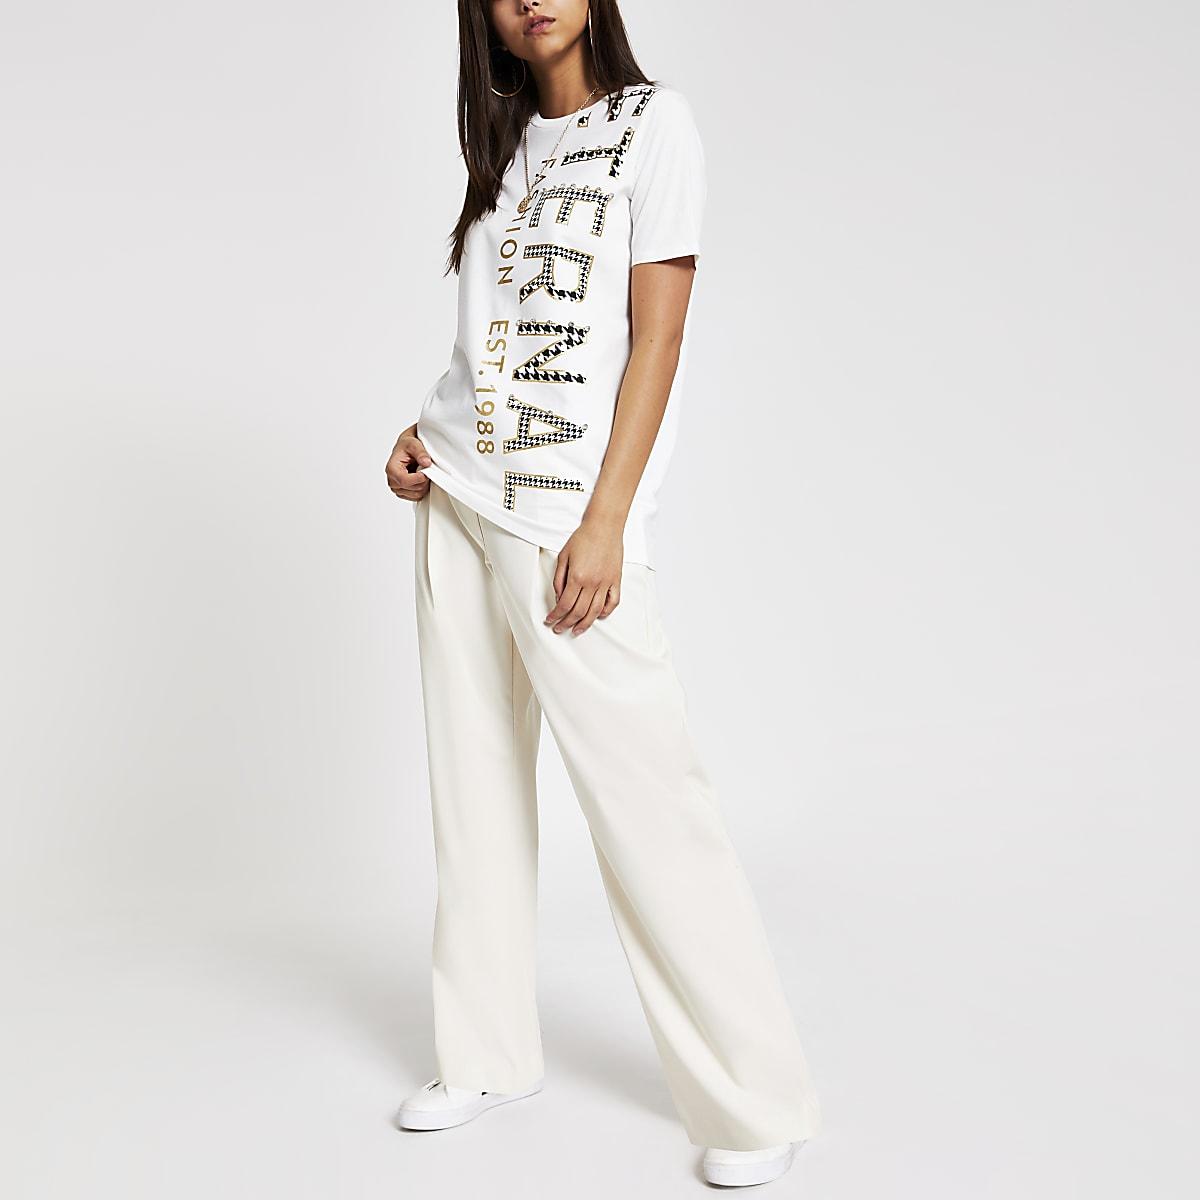 Crème verfraaid lang T-shirt met print